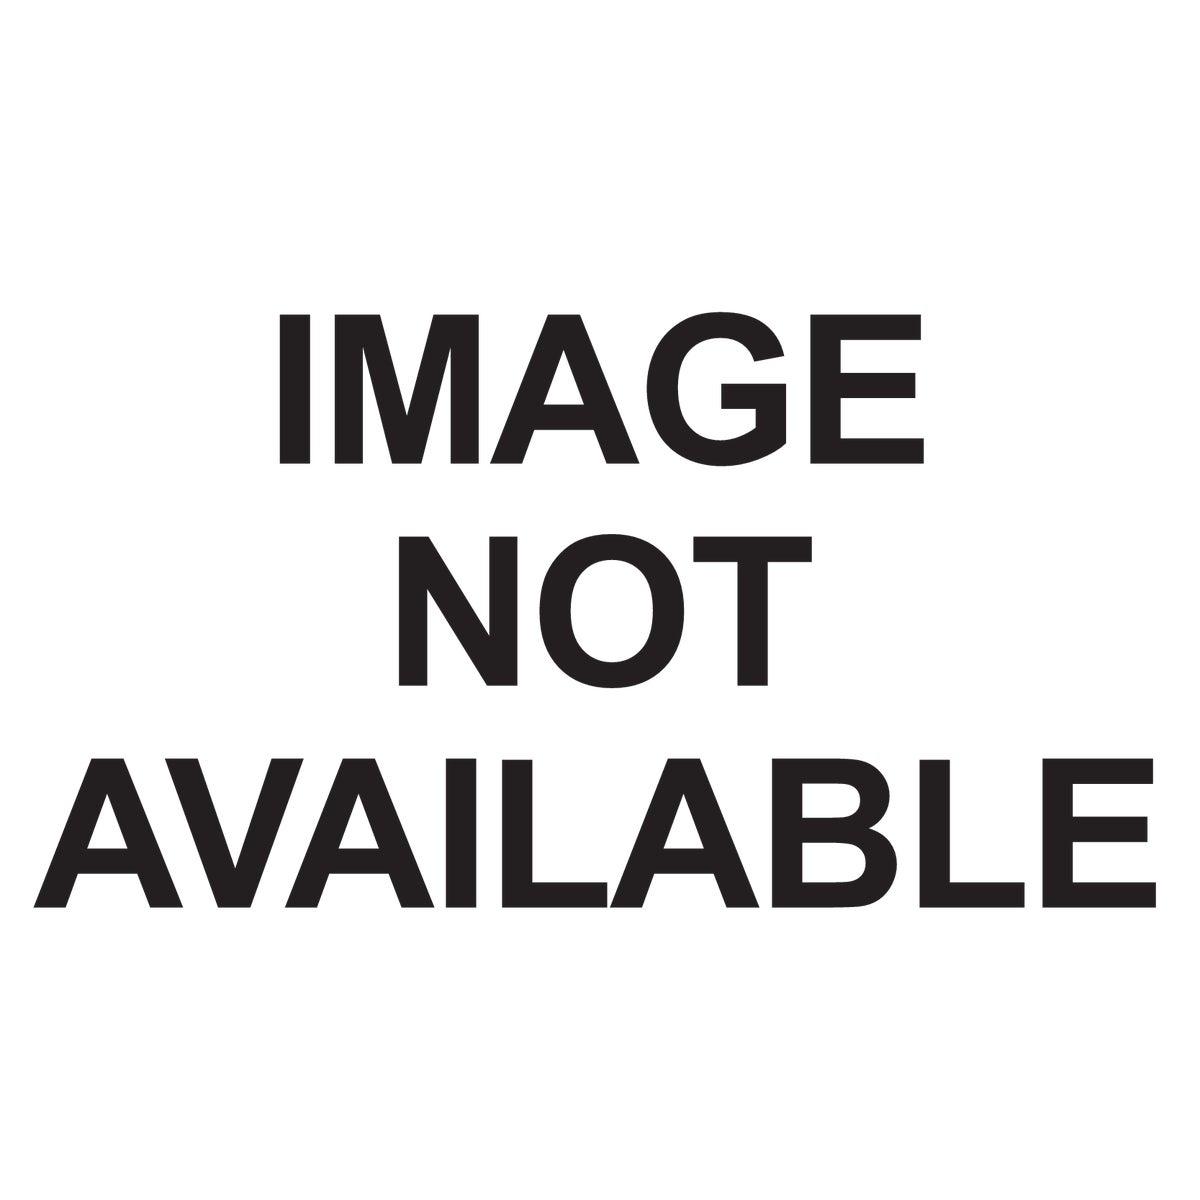 2-PORT WALL PLATE - R15-41091-2W1 by Leviton Mfg Co